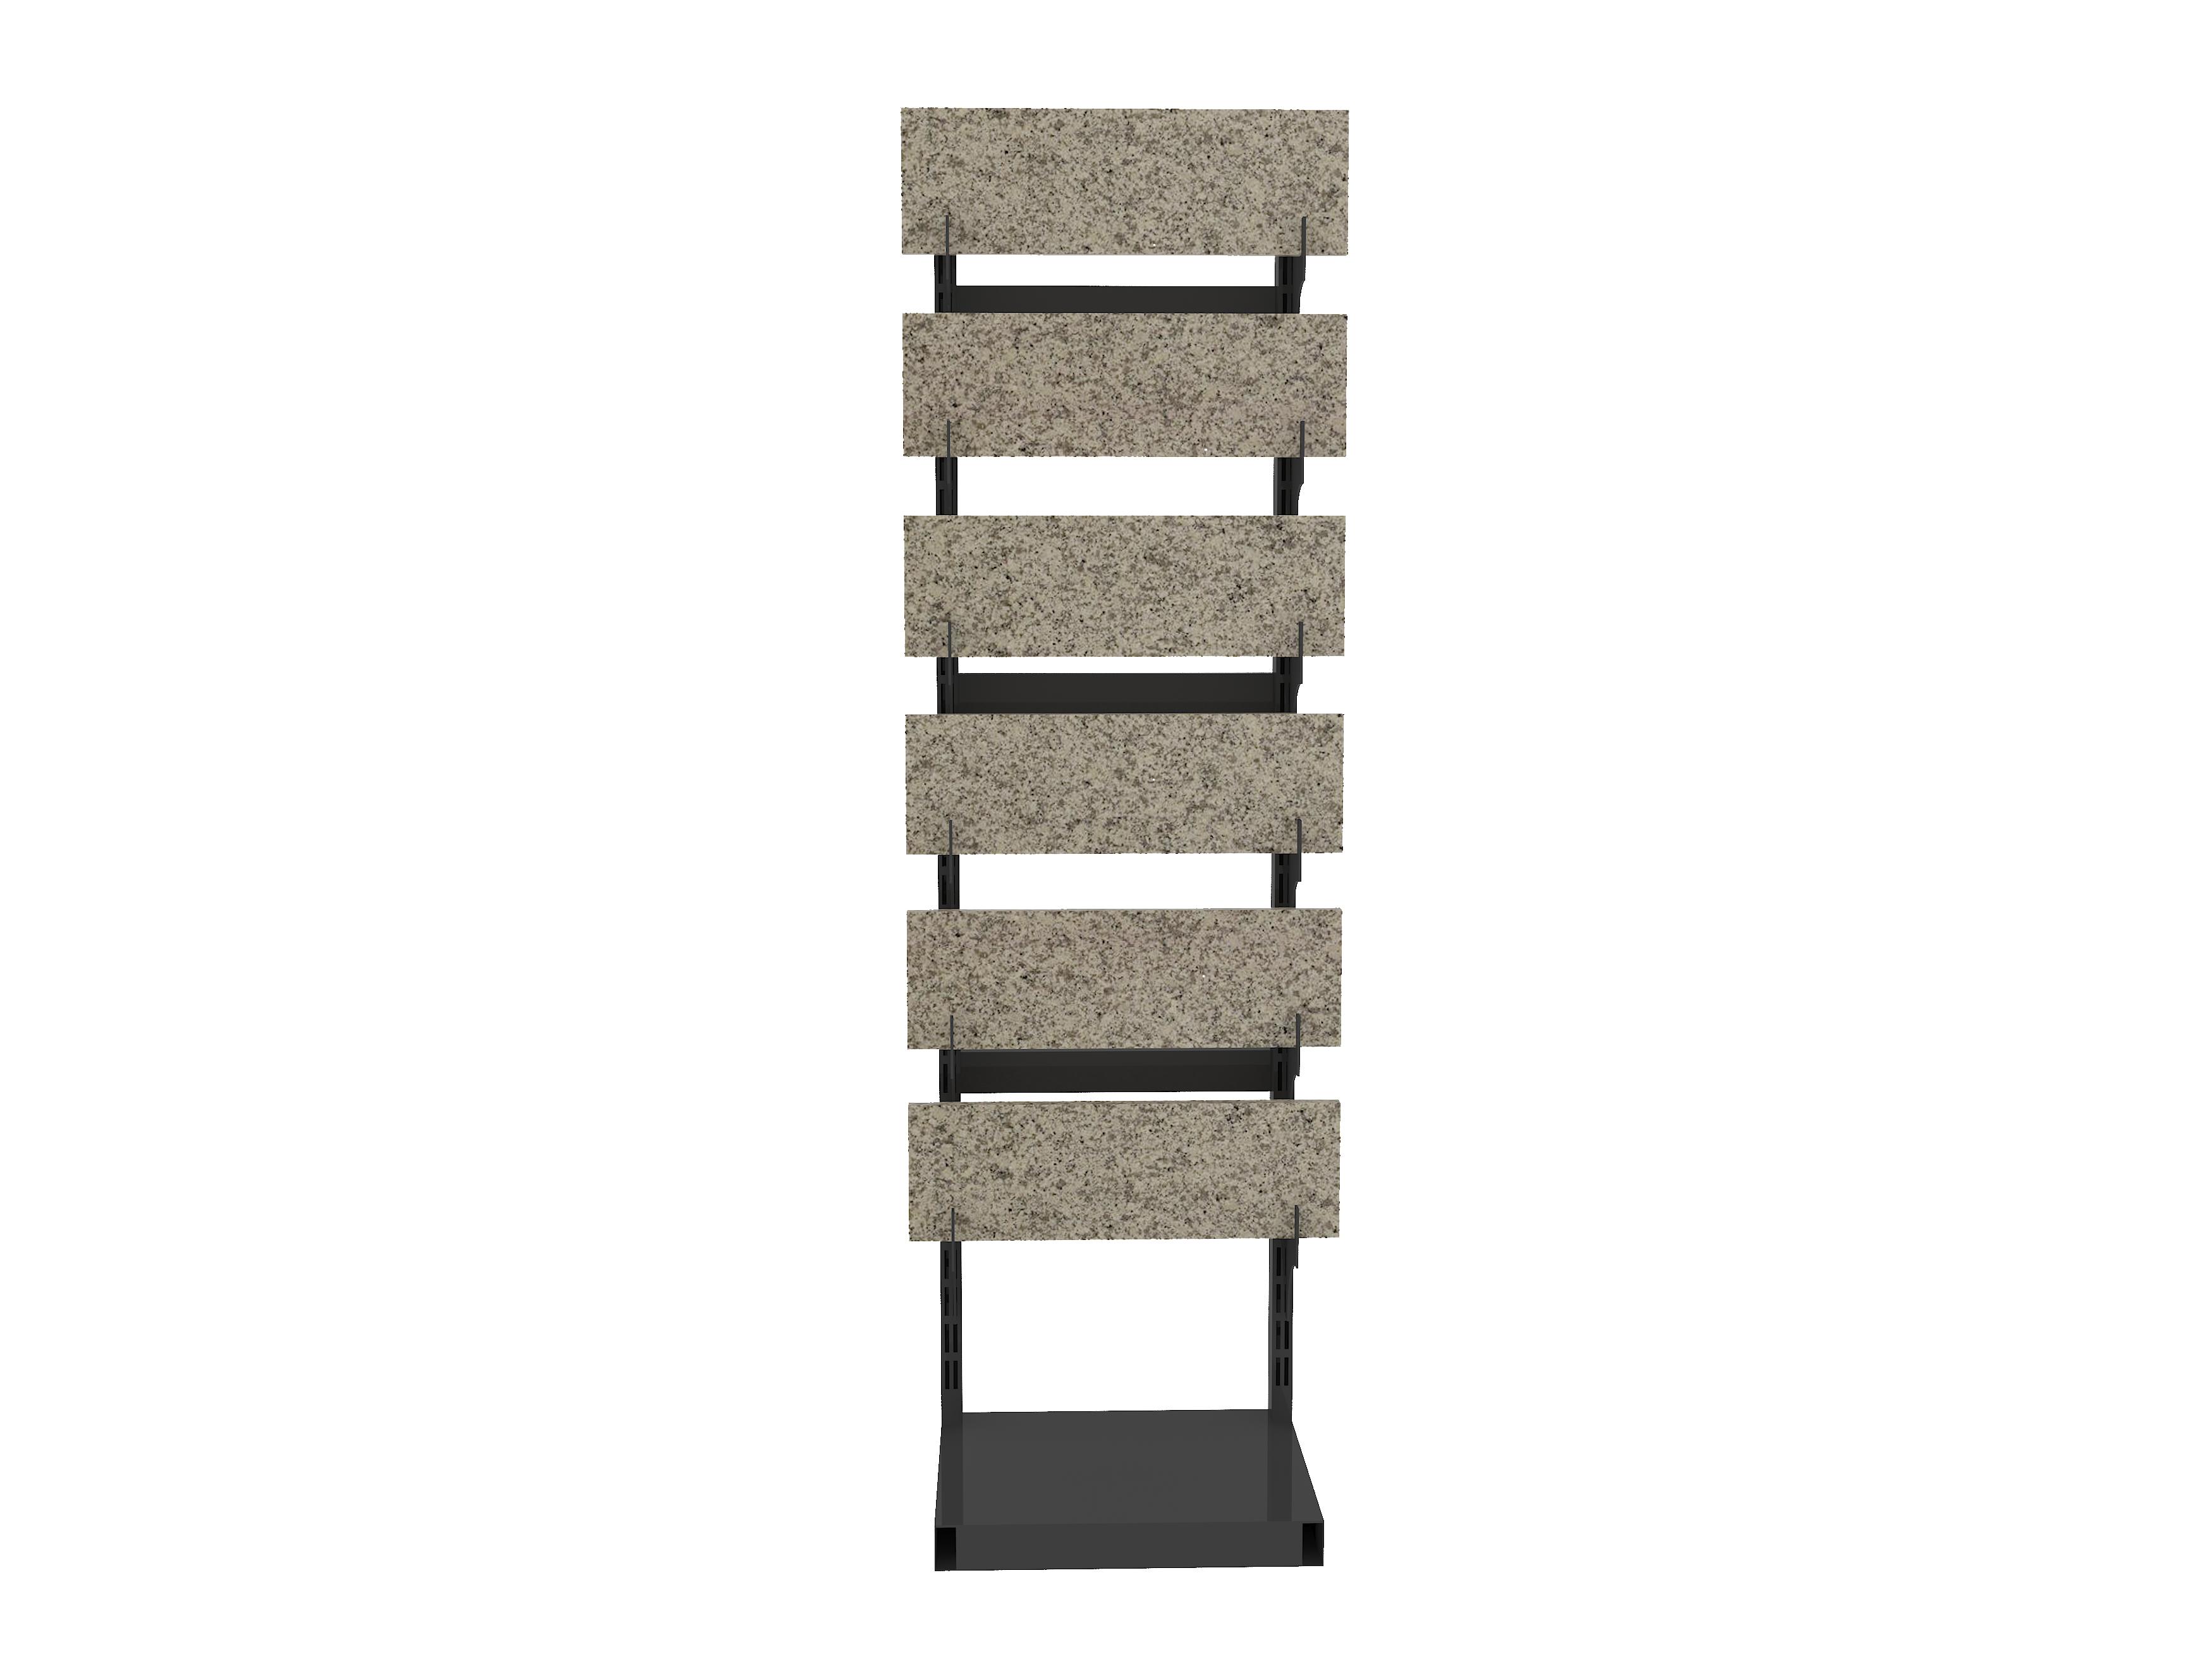 Marble stone sample display standceramic tile display rack dealers ceramic tile samples for floors step display shelf st 26 dailygadgetfo Images